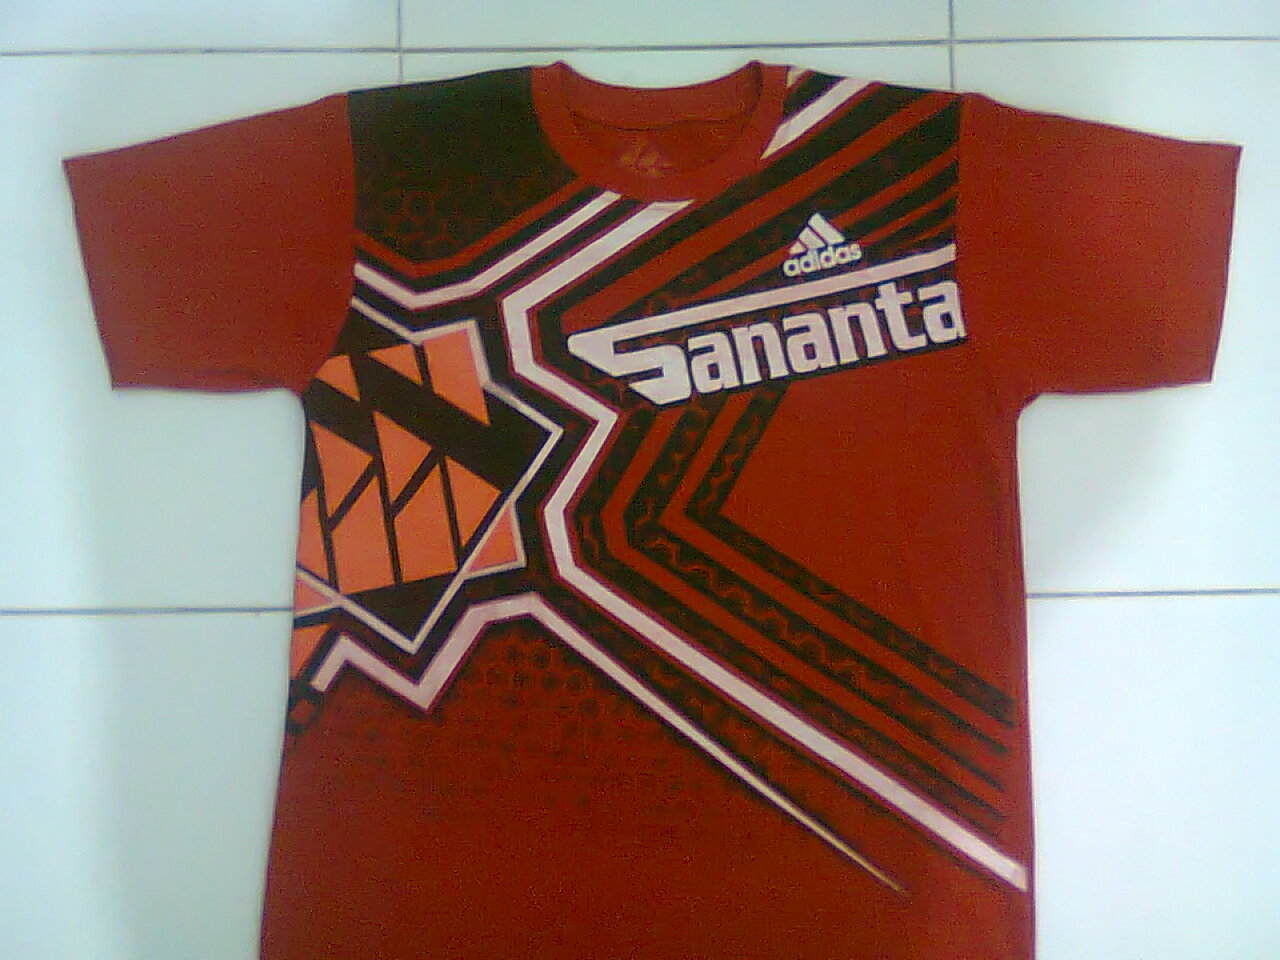 KAOS VOLLEYBALL PROLIGA 2012 JAKARTA SANANTA